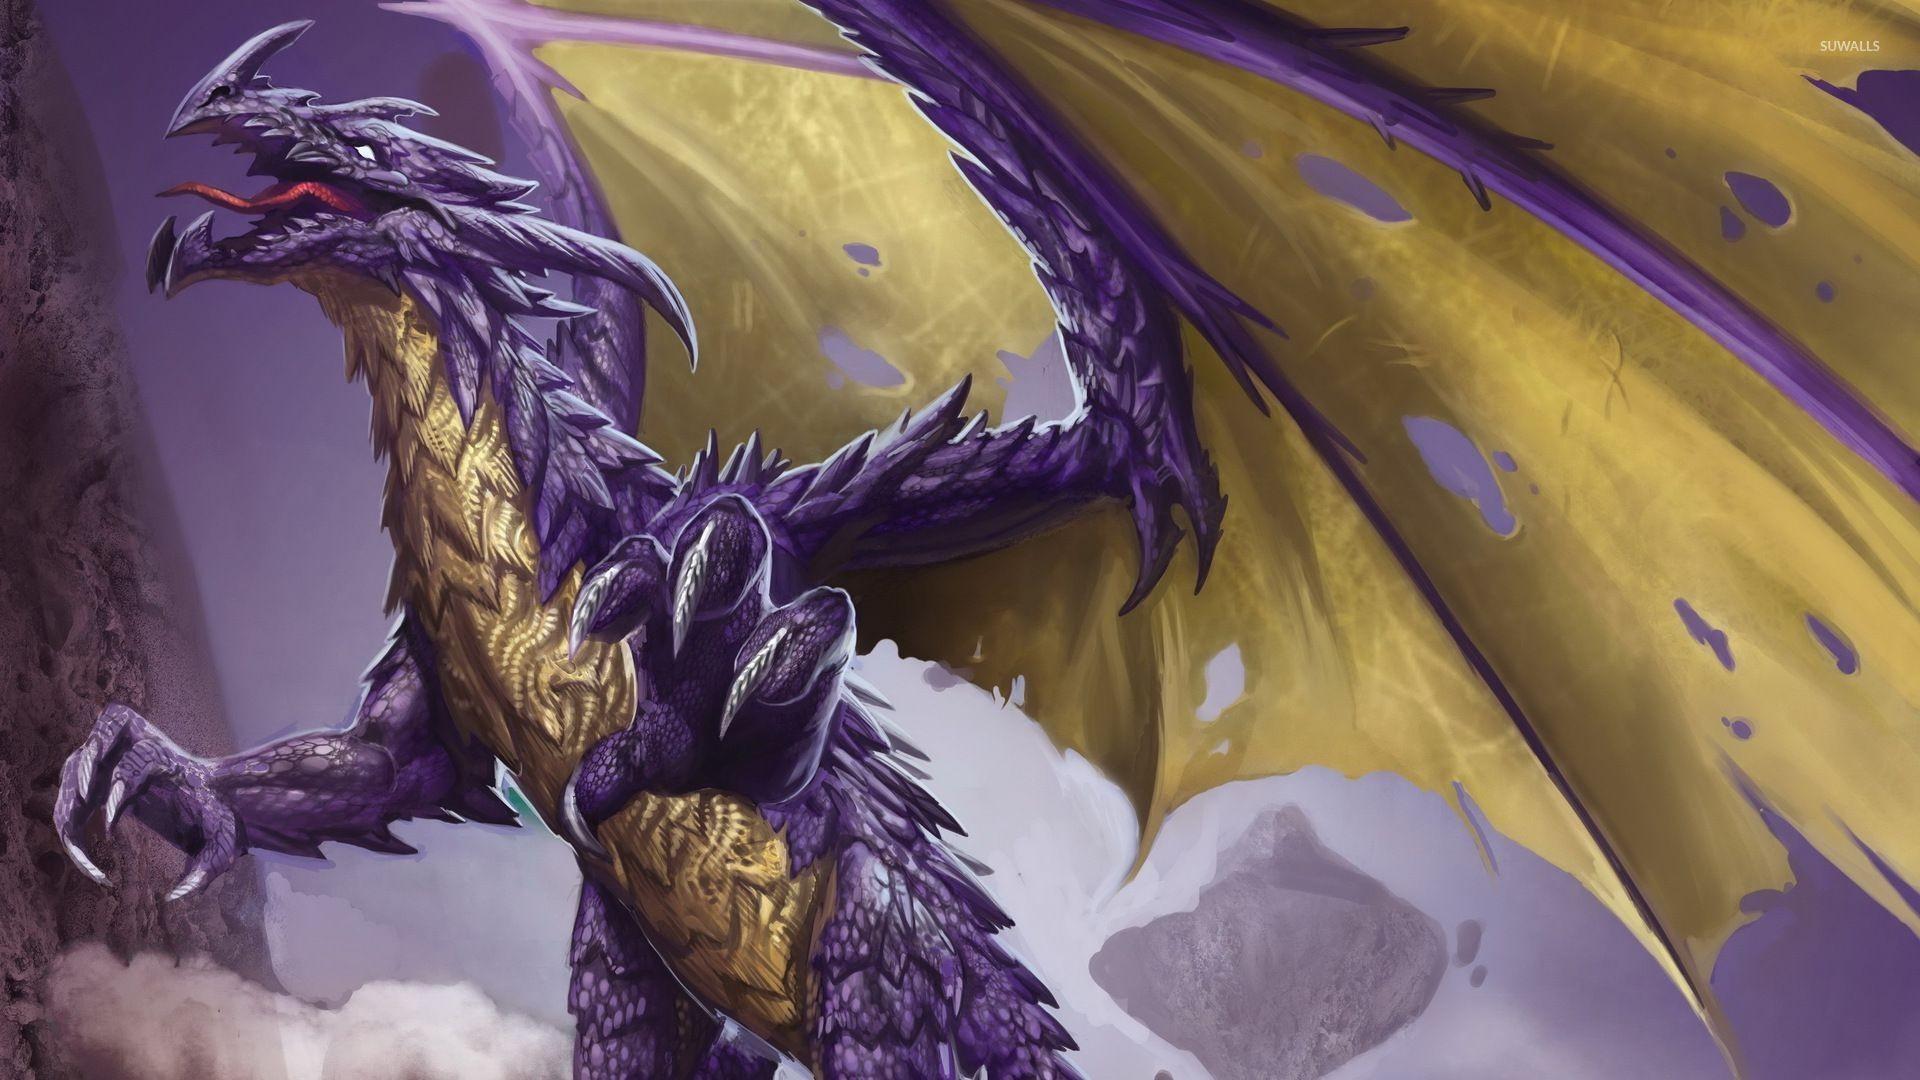 Res: 1920x1080, Purple dragon wallpaper